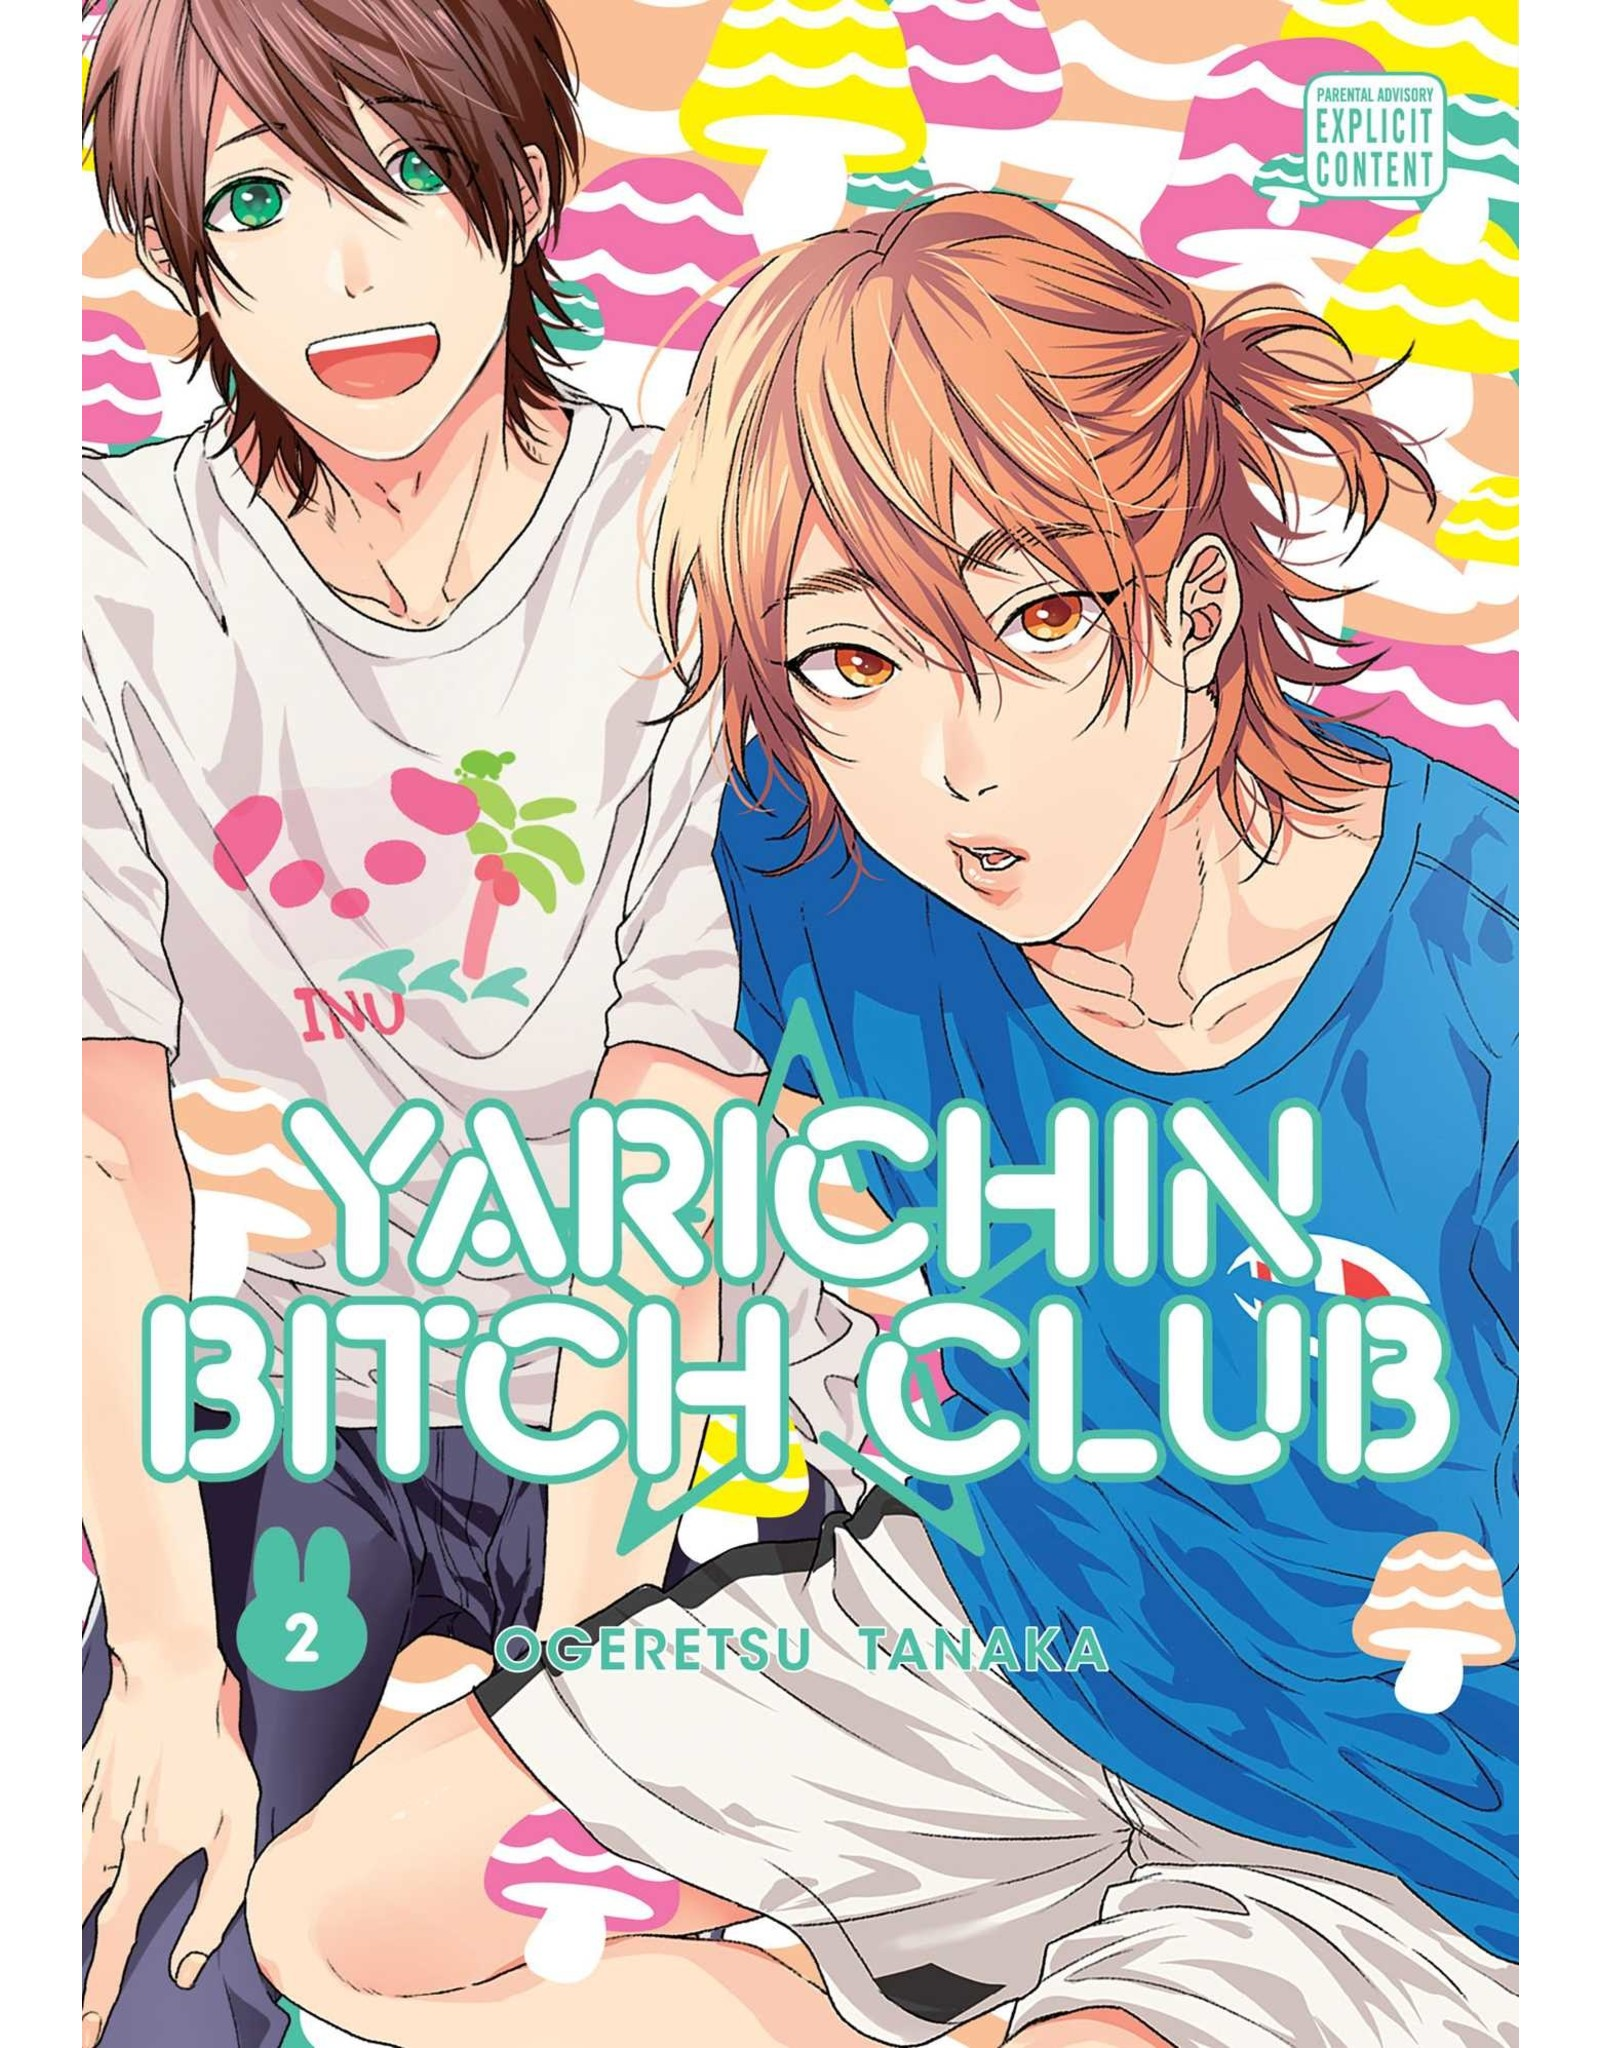 Yarichin Bitch Club 2 (English)